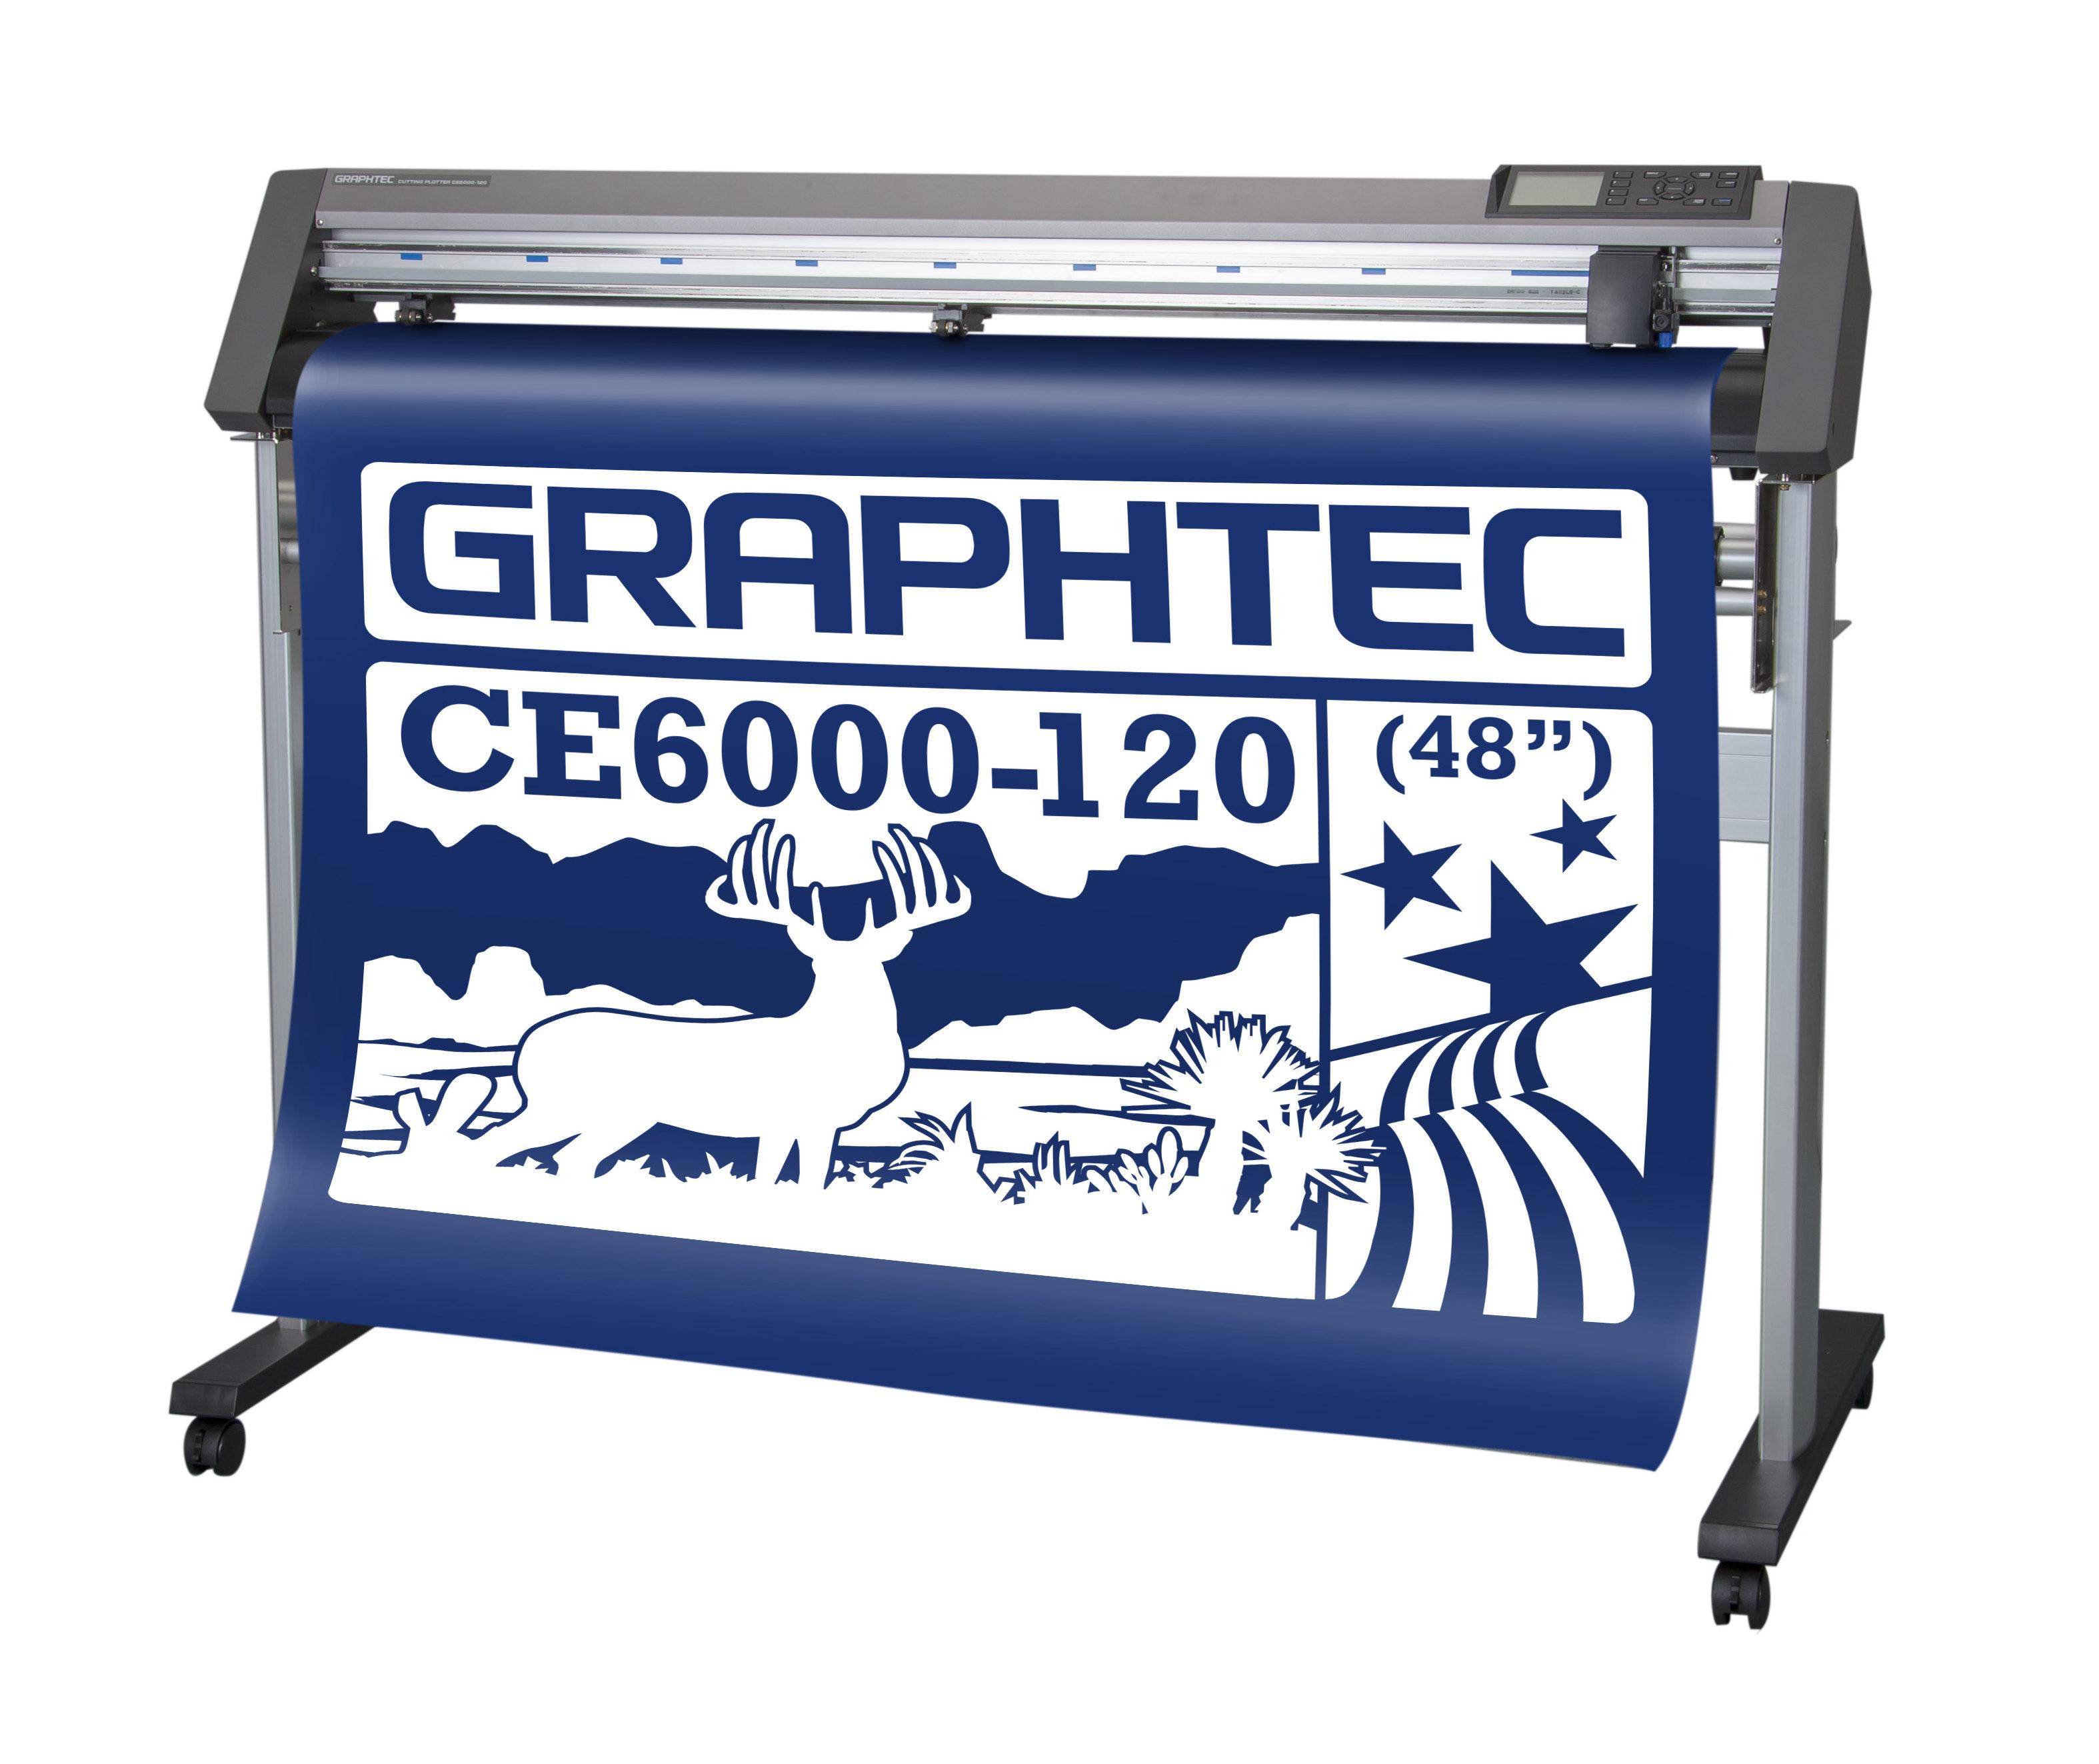 Rolkowy ploter tnący GRAPHTEC CE6000-120